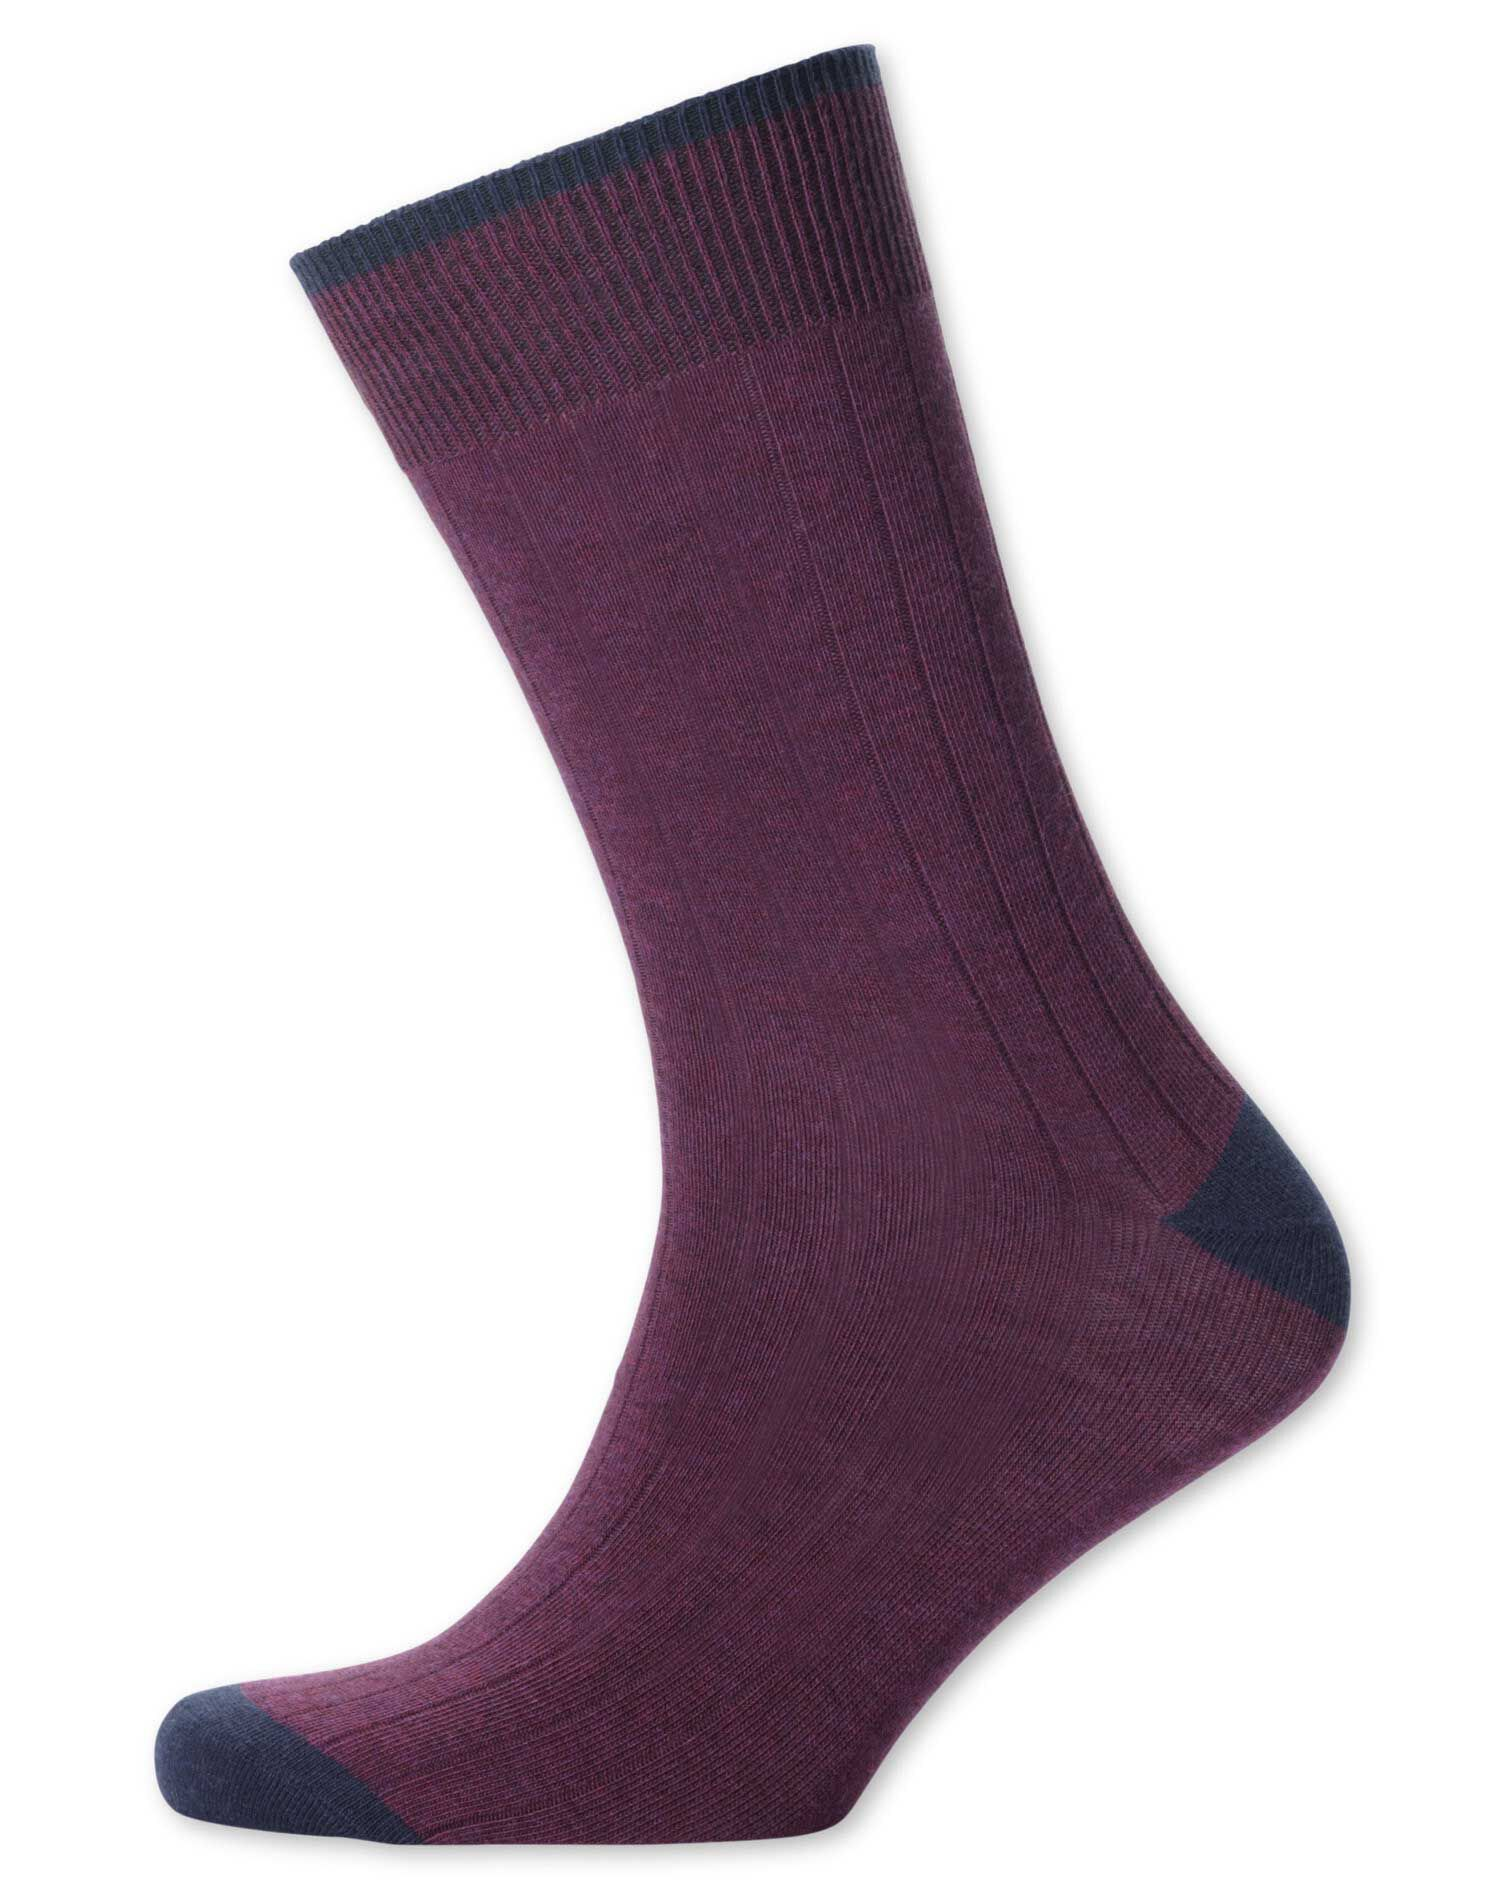 Berry Ribbed Socks Size Medium by Charles Tyrwhitt